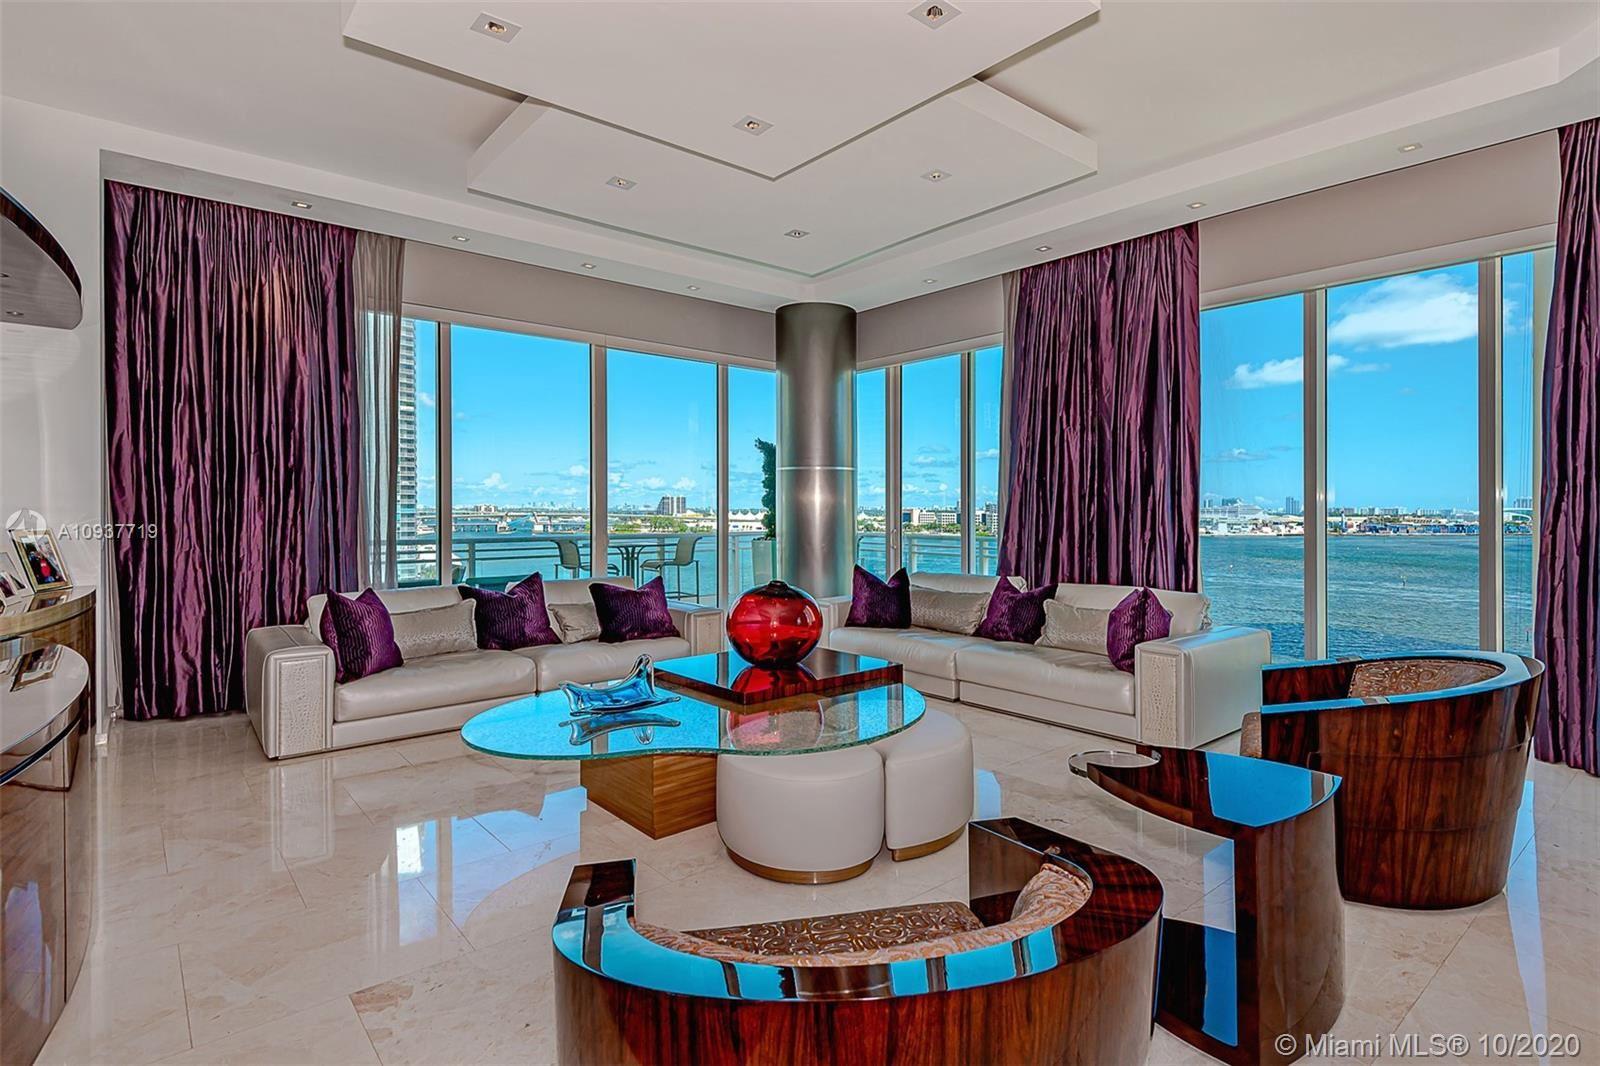 900 Brickell Key Blvd #903, Miami, FL 33131 - #: A10937719